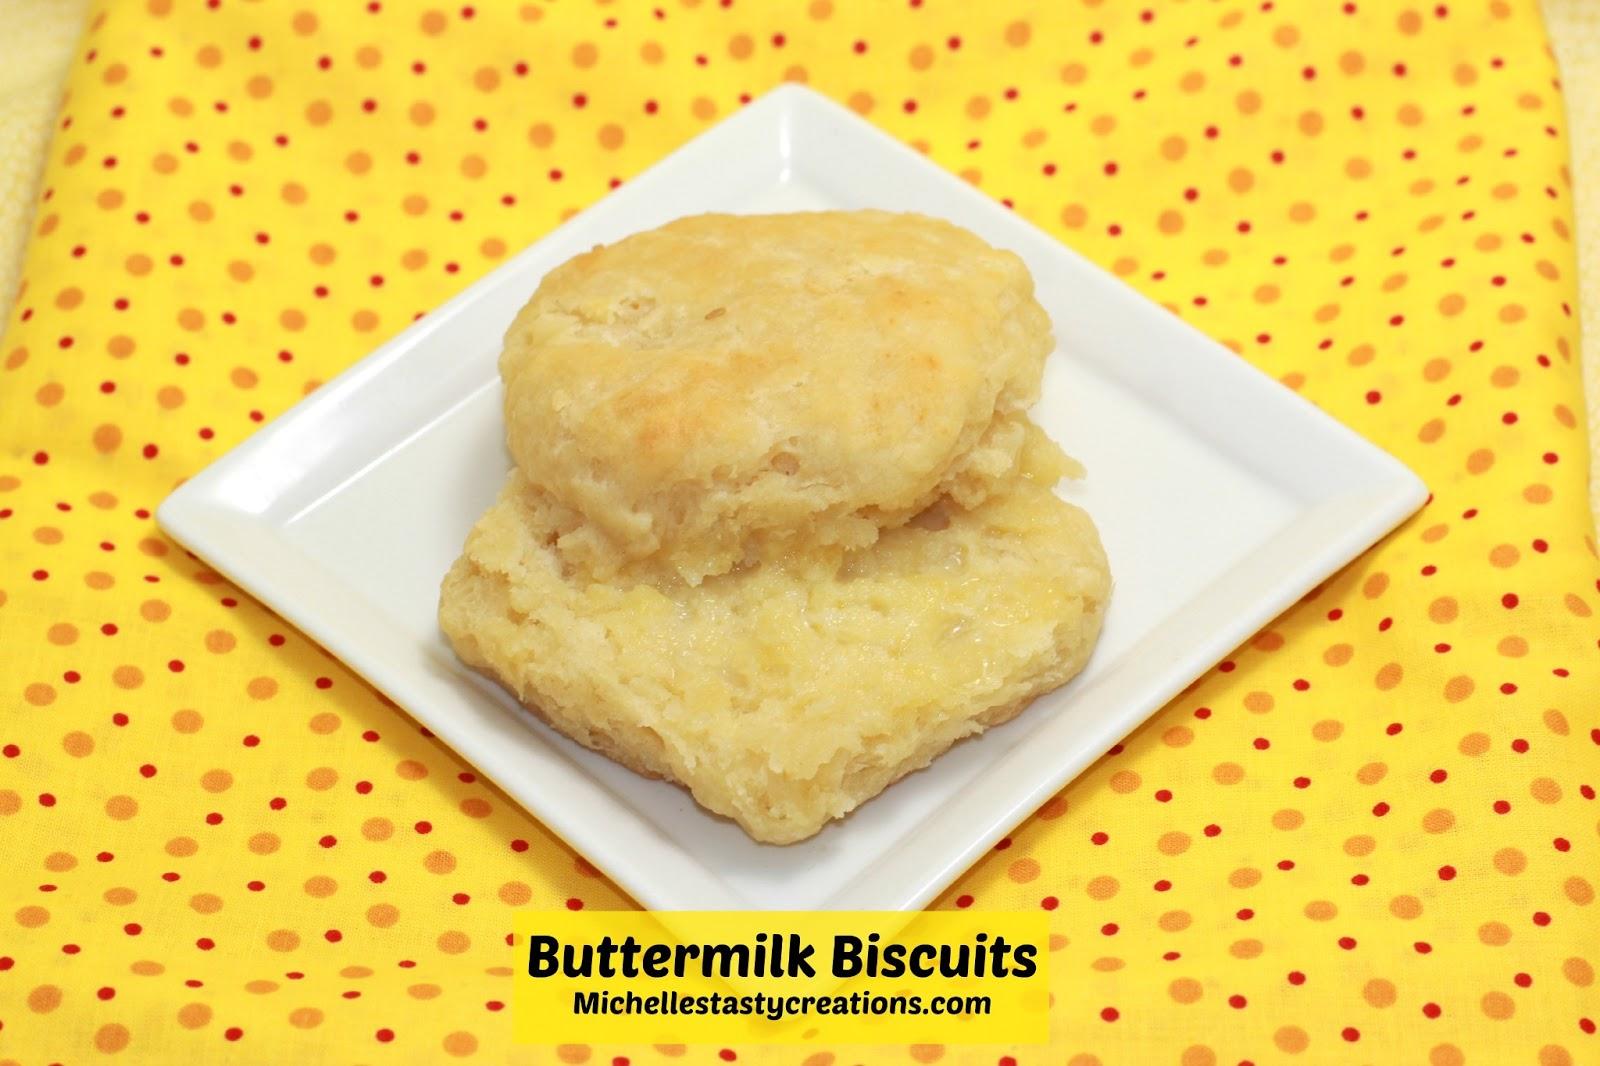 Michelle's Tasty Creations: Buttermilk Biscuits